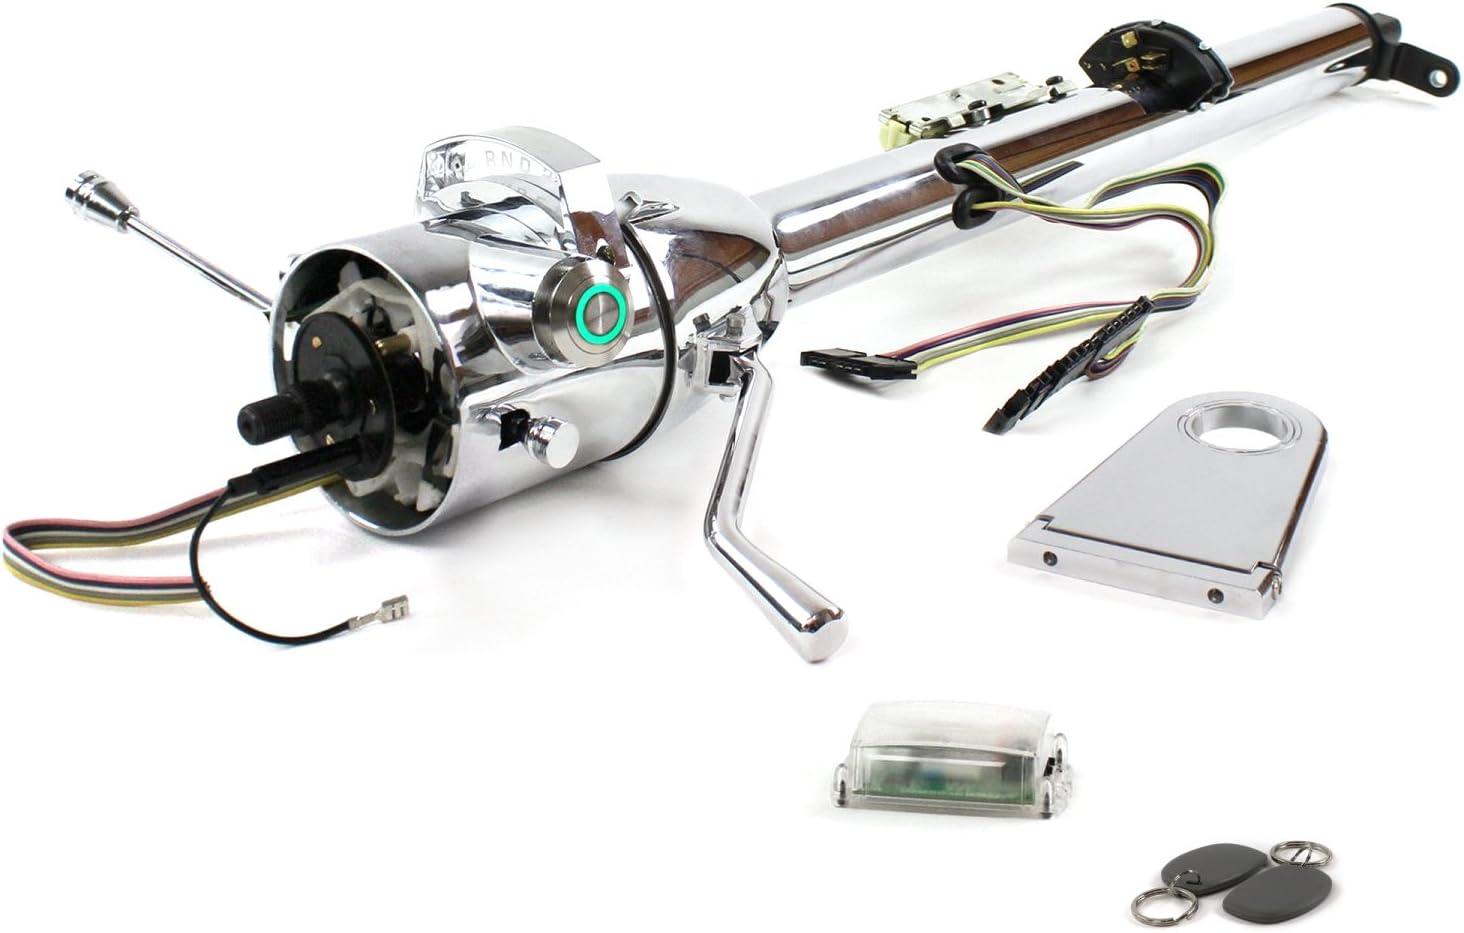 Helix 704355 Steering Column Nashville-Davidson Mall Latest item Chrome - Shift D Dro 5.5